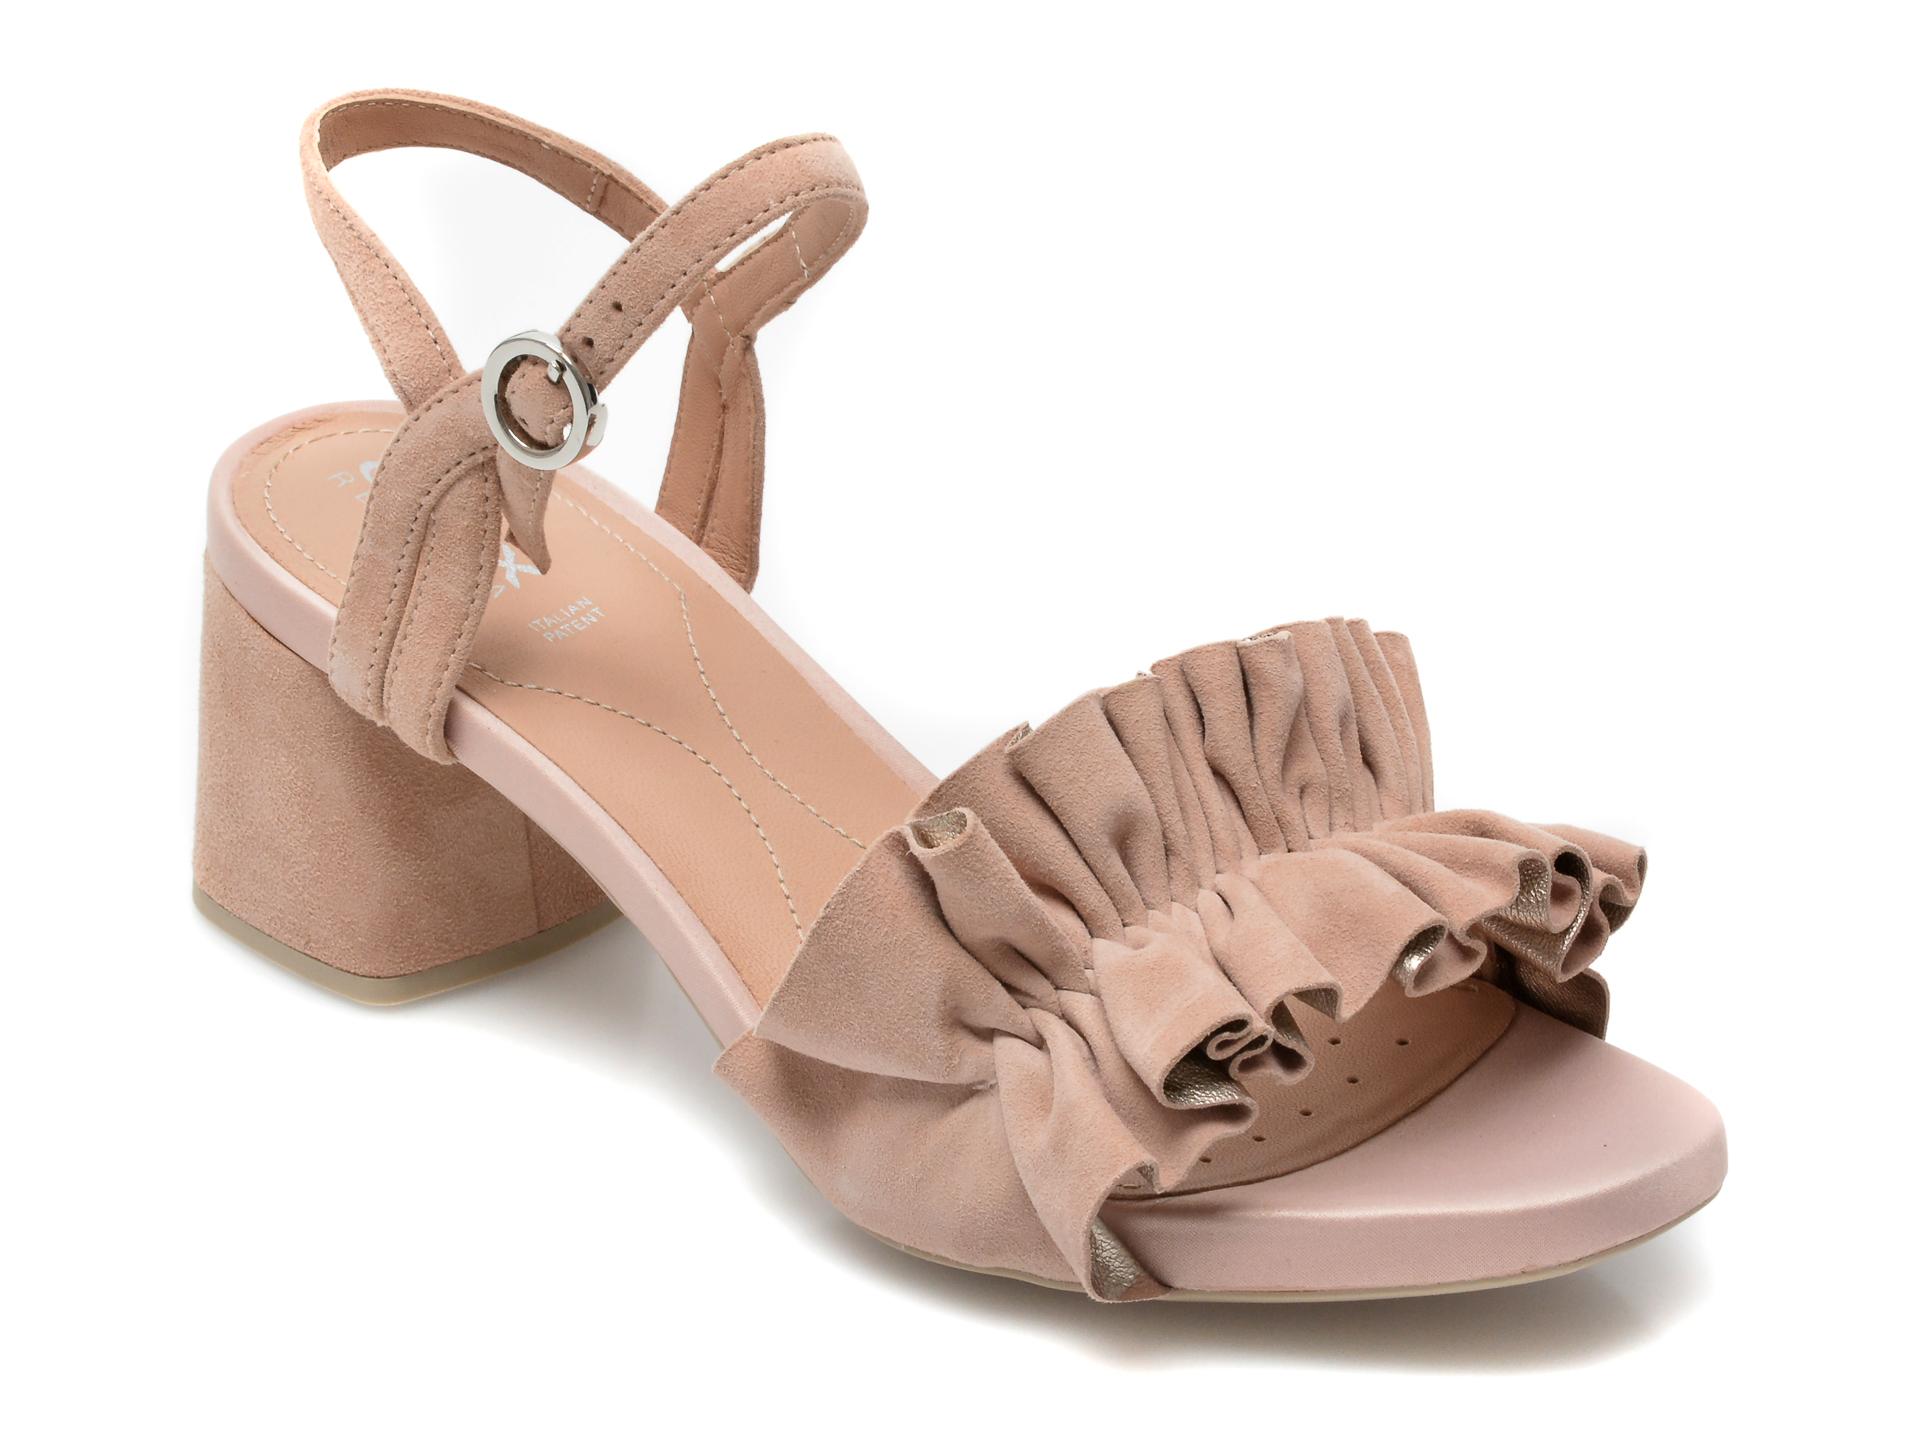 Sandale GEOX nude, D15HAC, din piele intoarsa